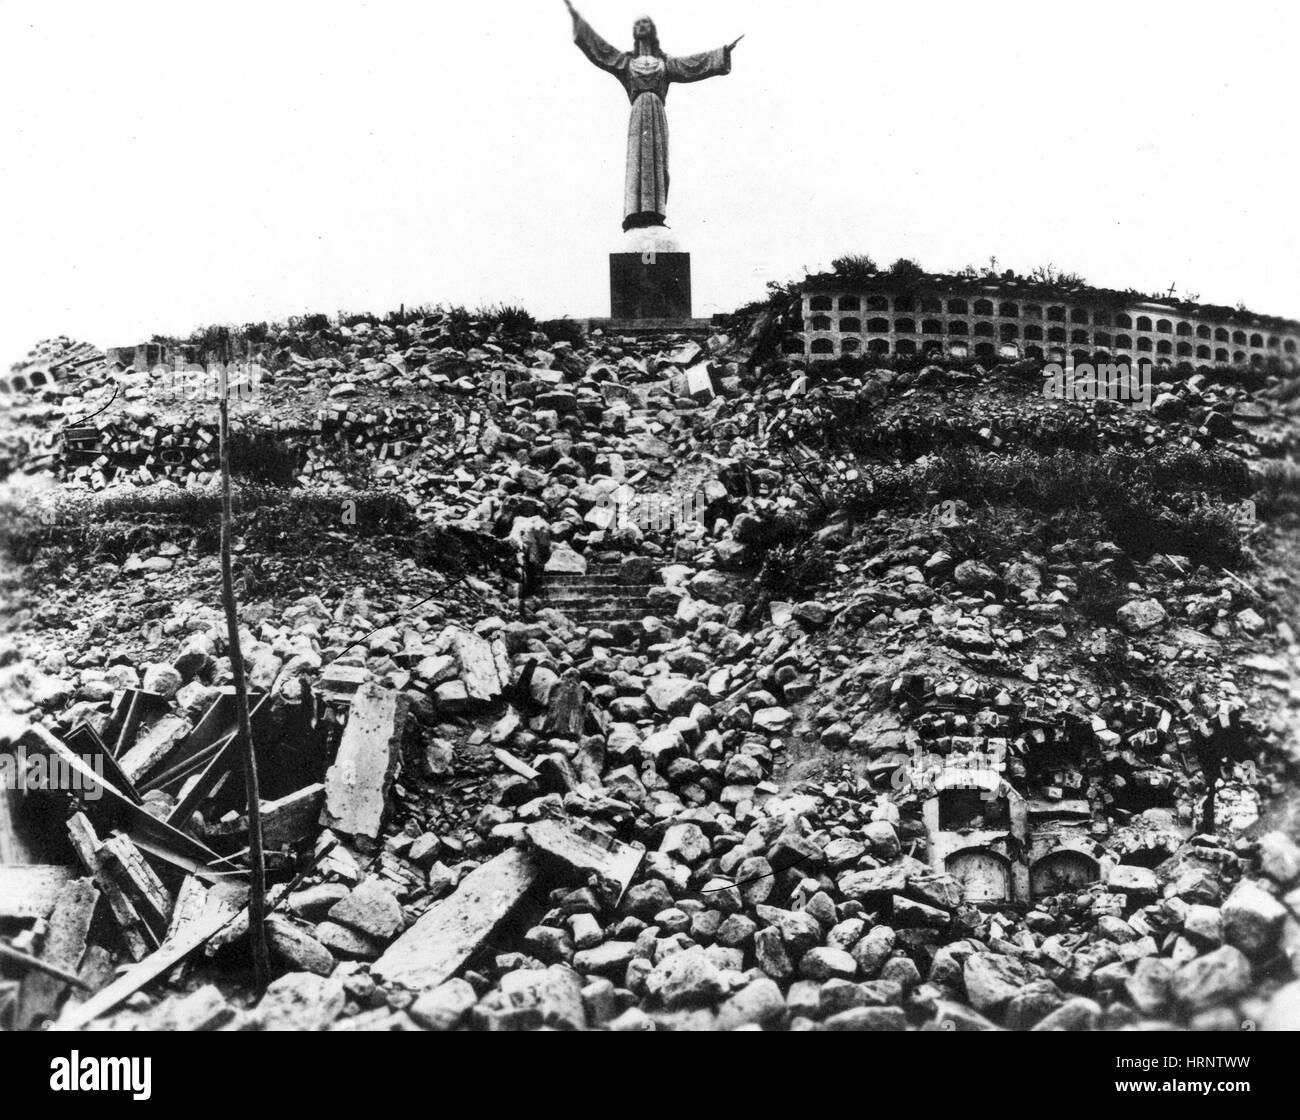 Ancash Earthquake, Peru, 1970 - Stock Image